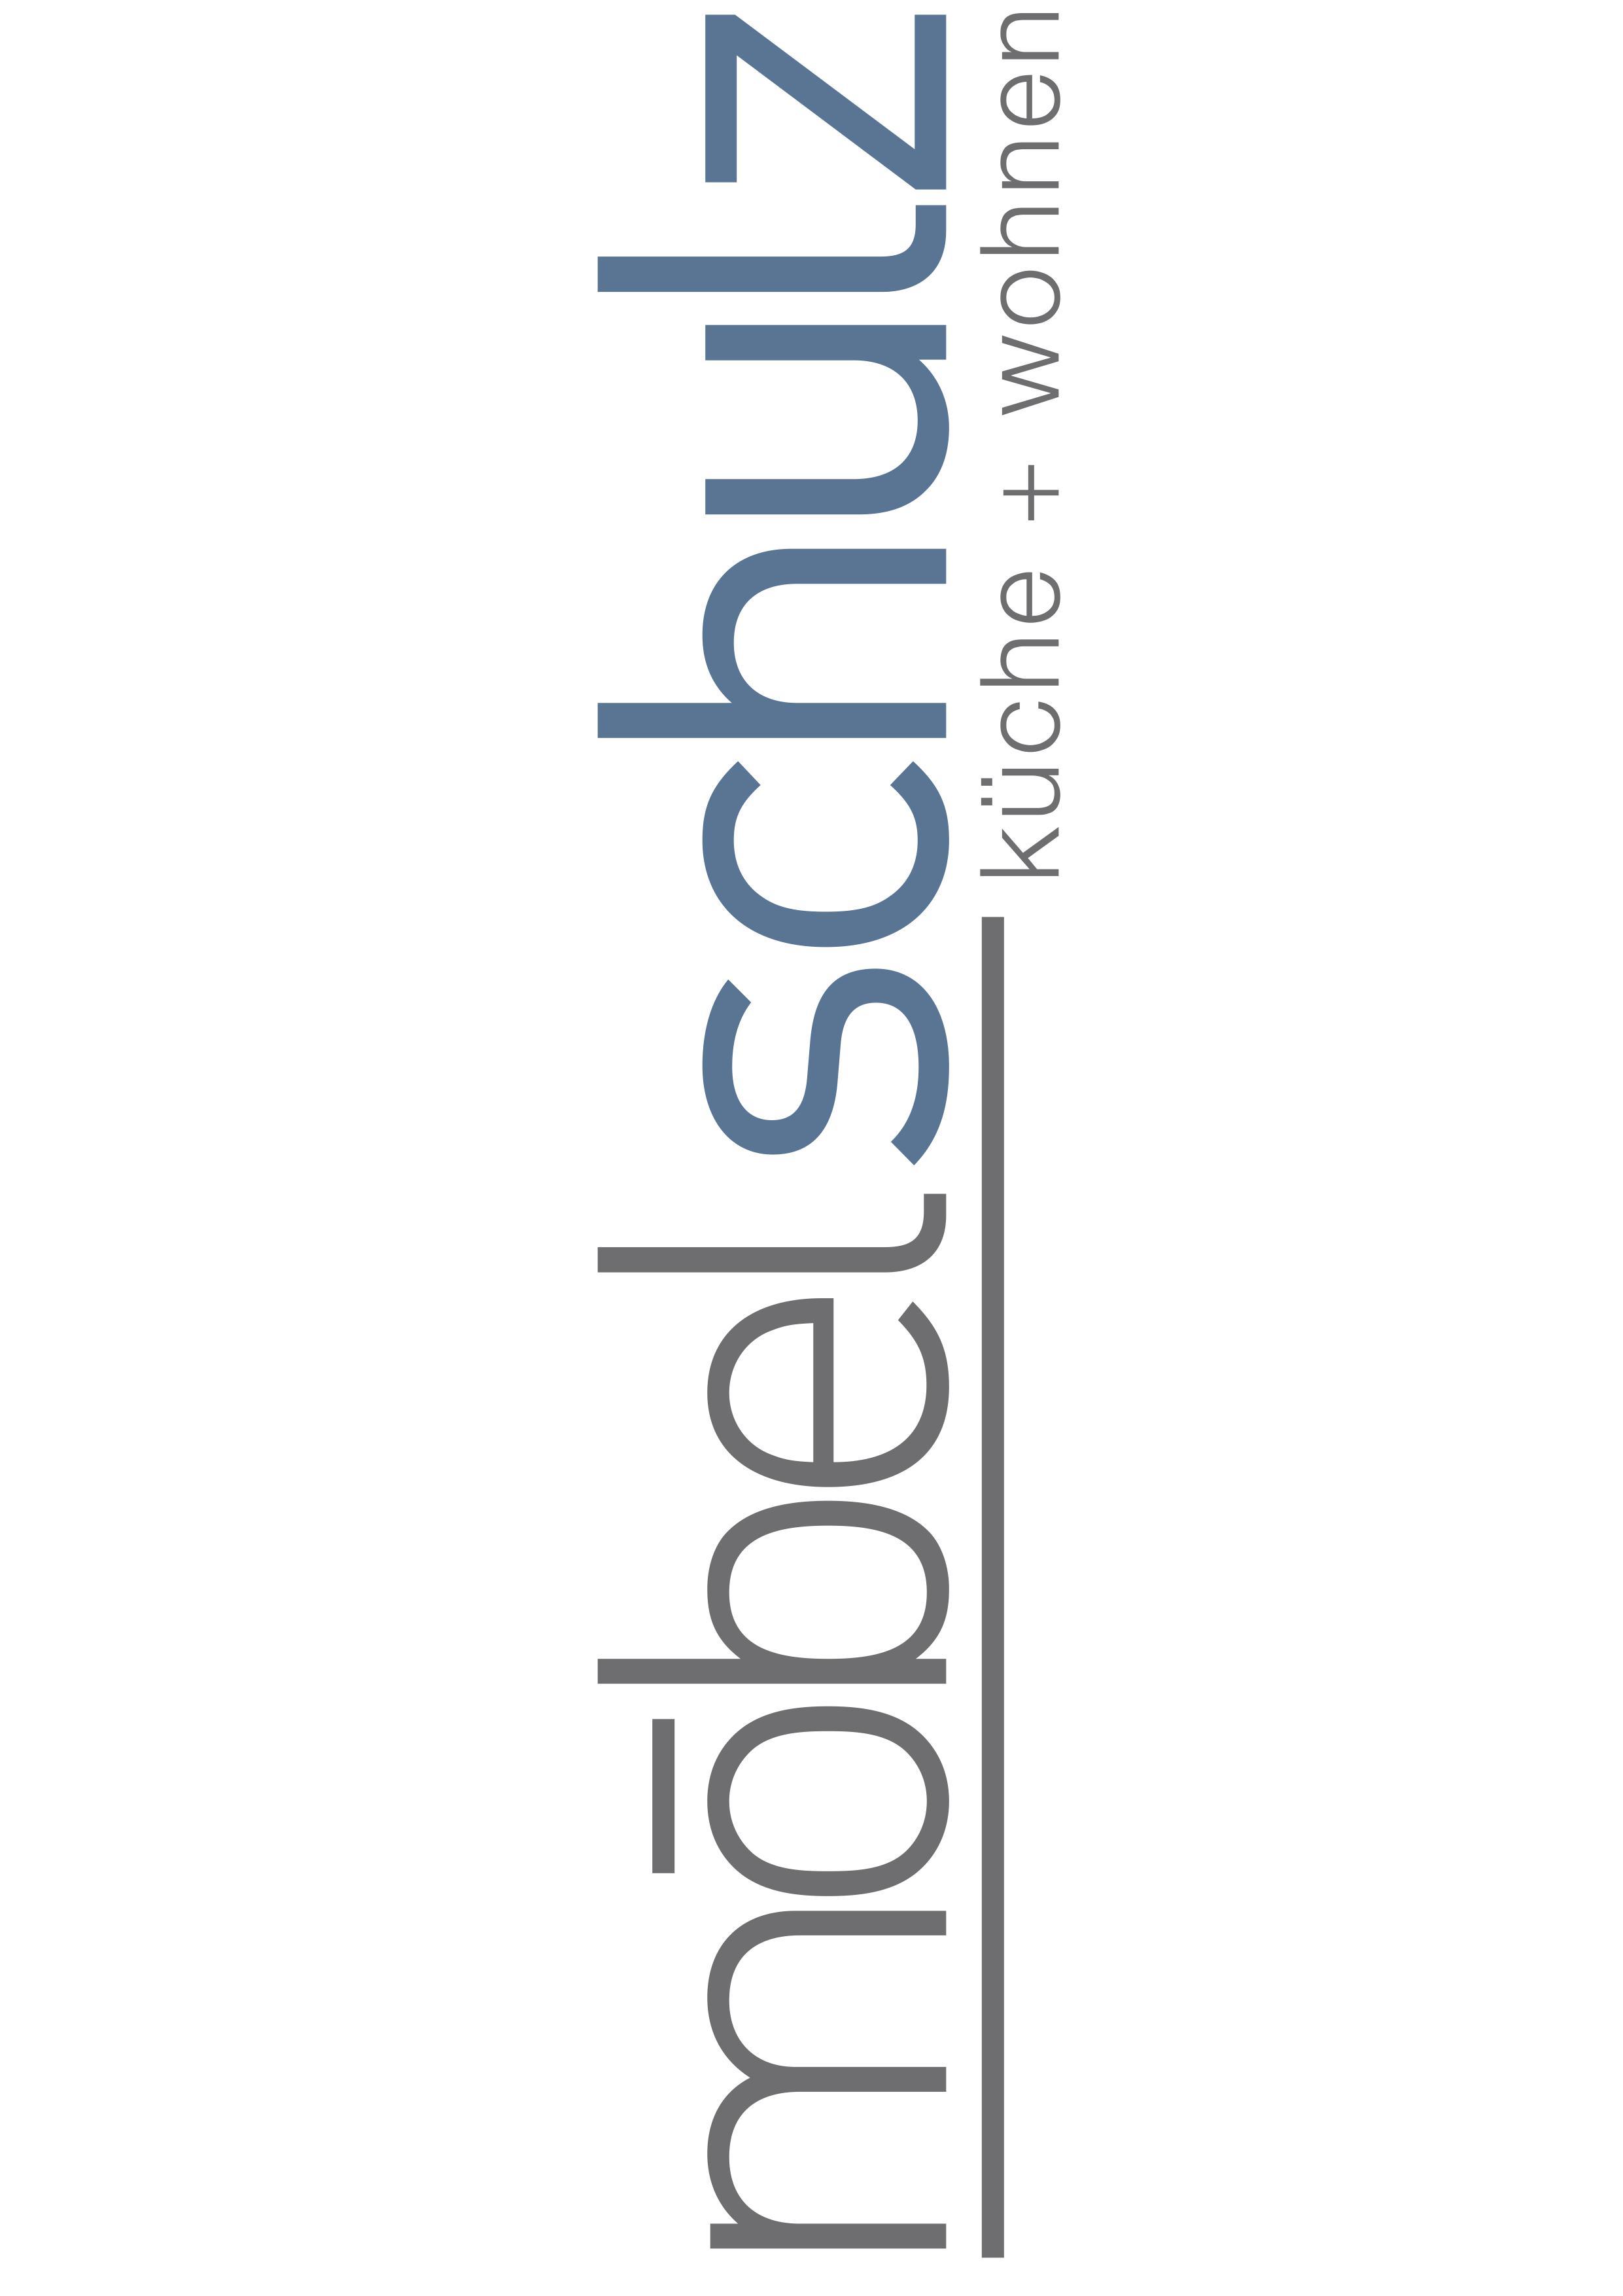 moebel-schulz-gmbh-neumuenster logo